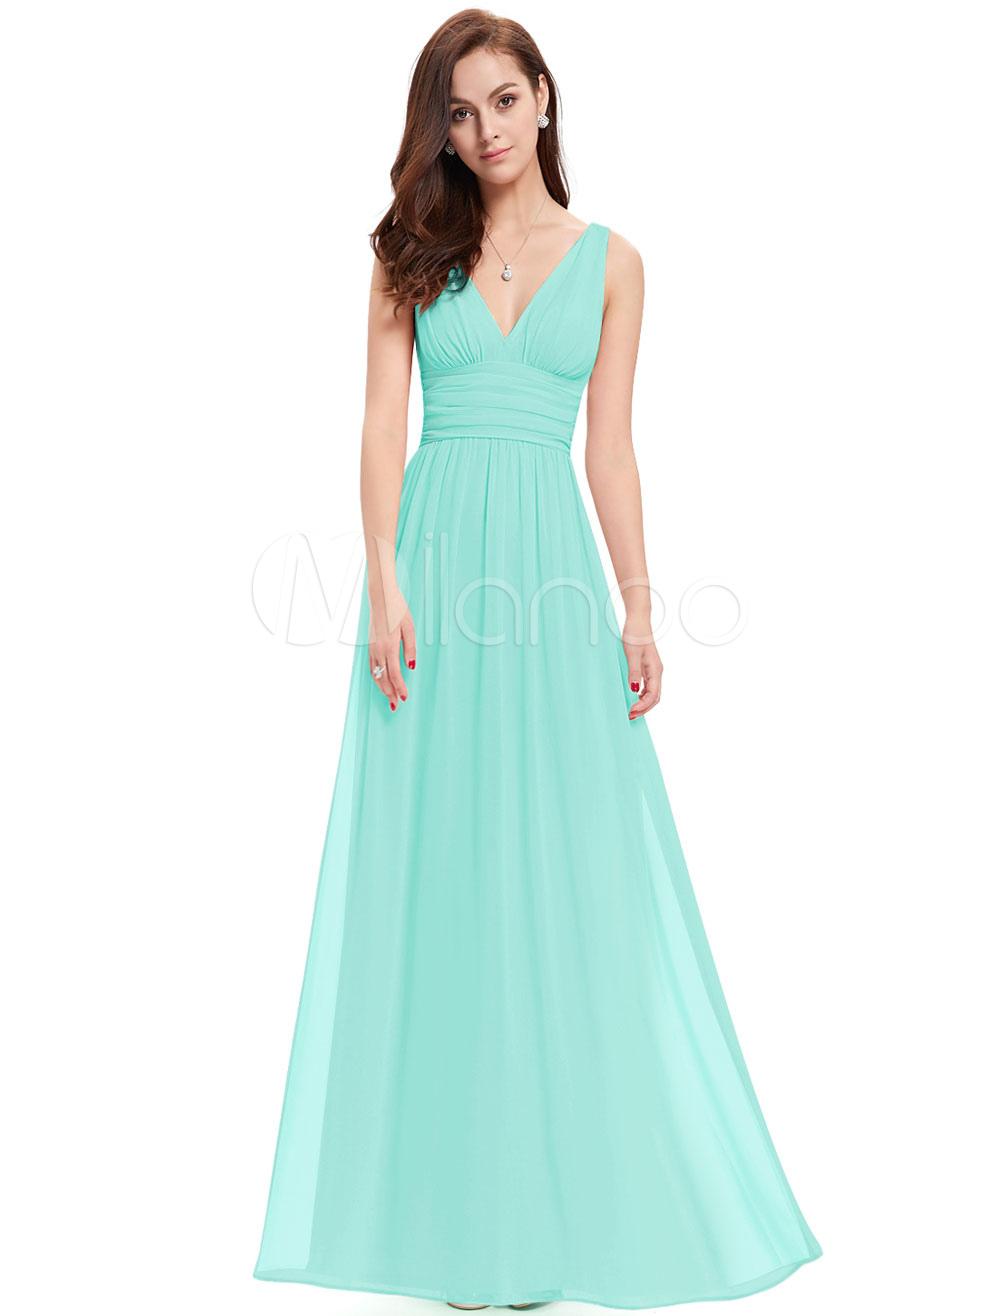 Chiffon Mother Dress Mint Green Long Prom Dress V Neck A Line Floor Length Party Dress (Wedding) photo